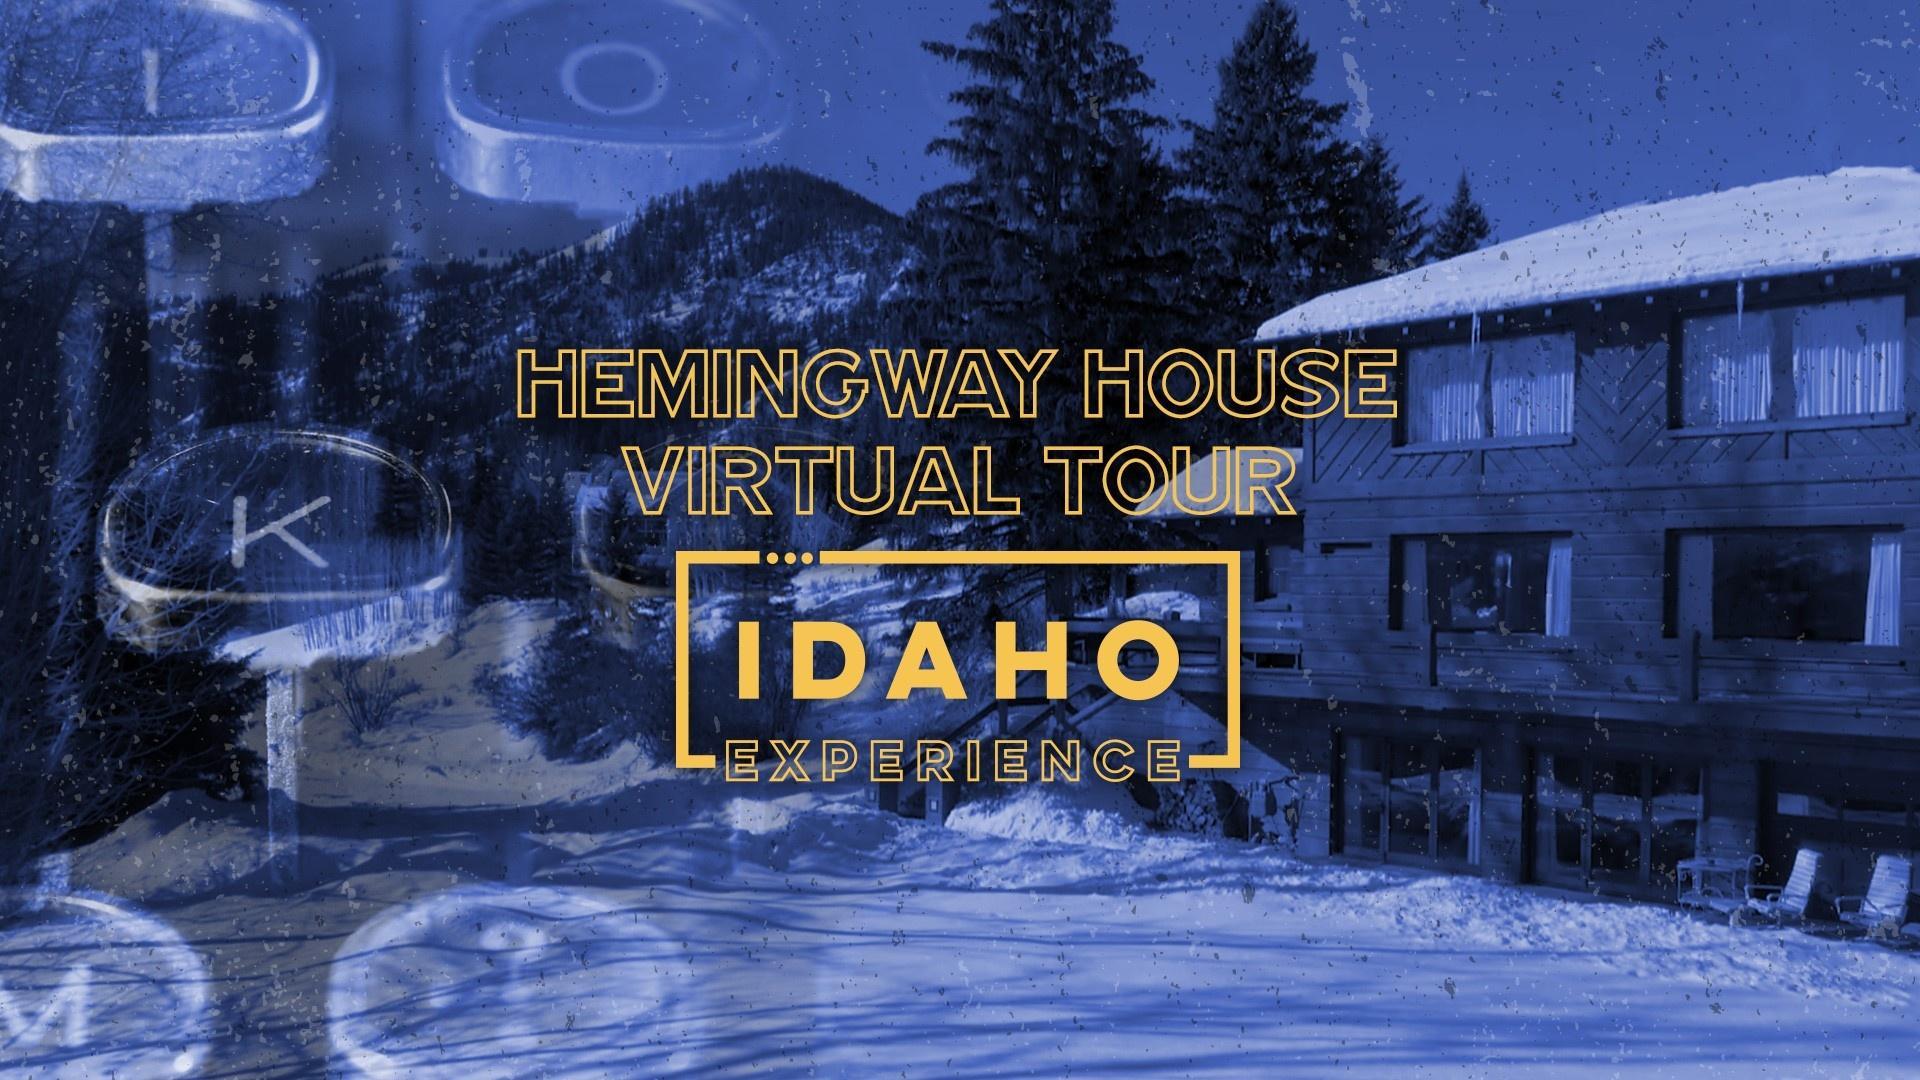 Hemingway House Virtual Tour